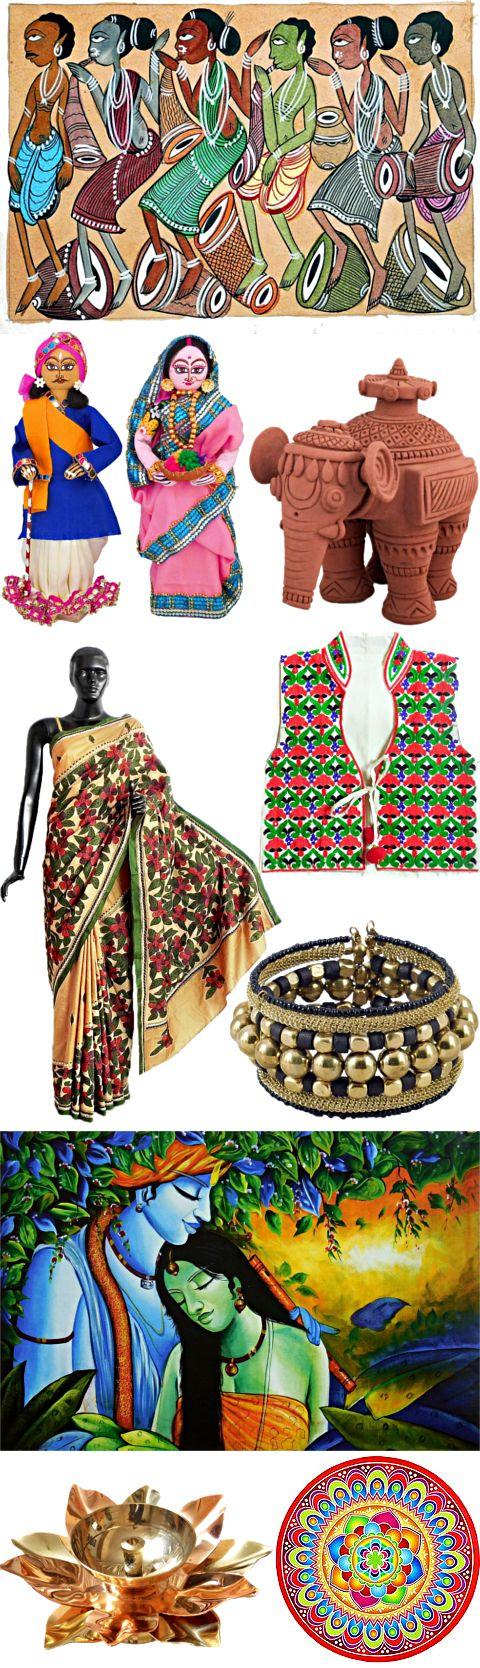 www.dollsofindia.com